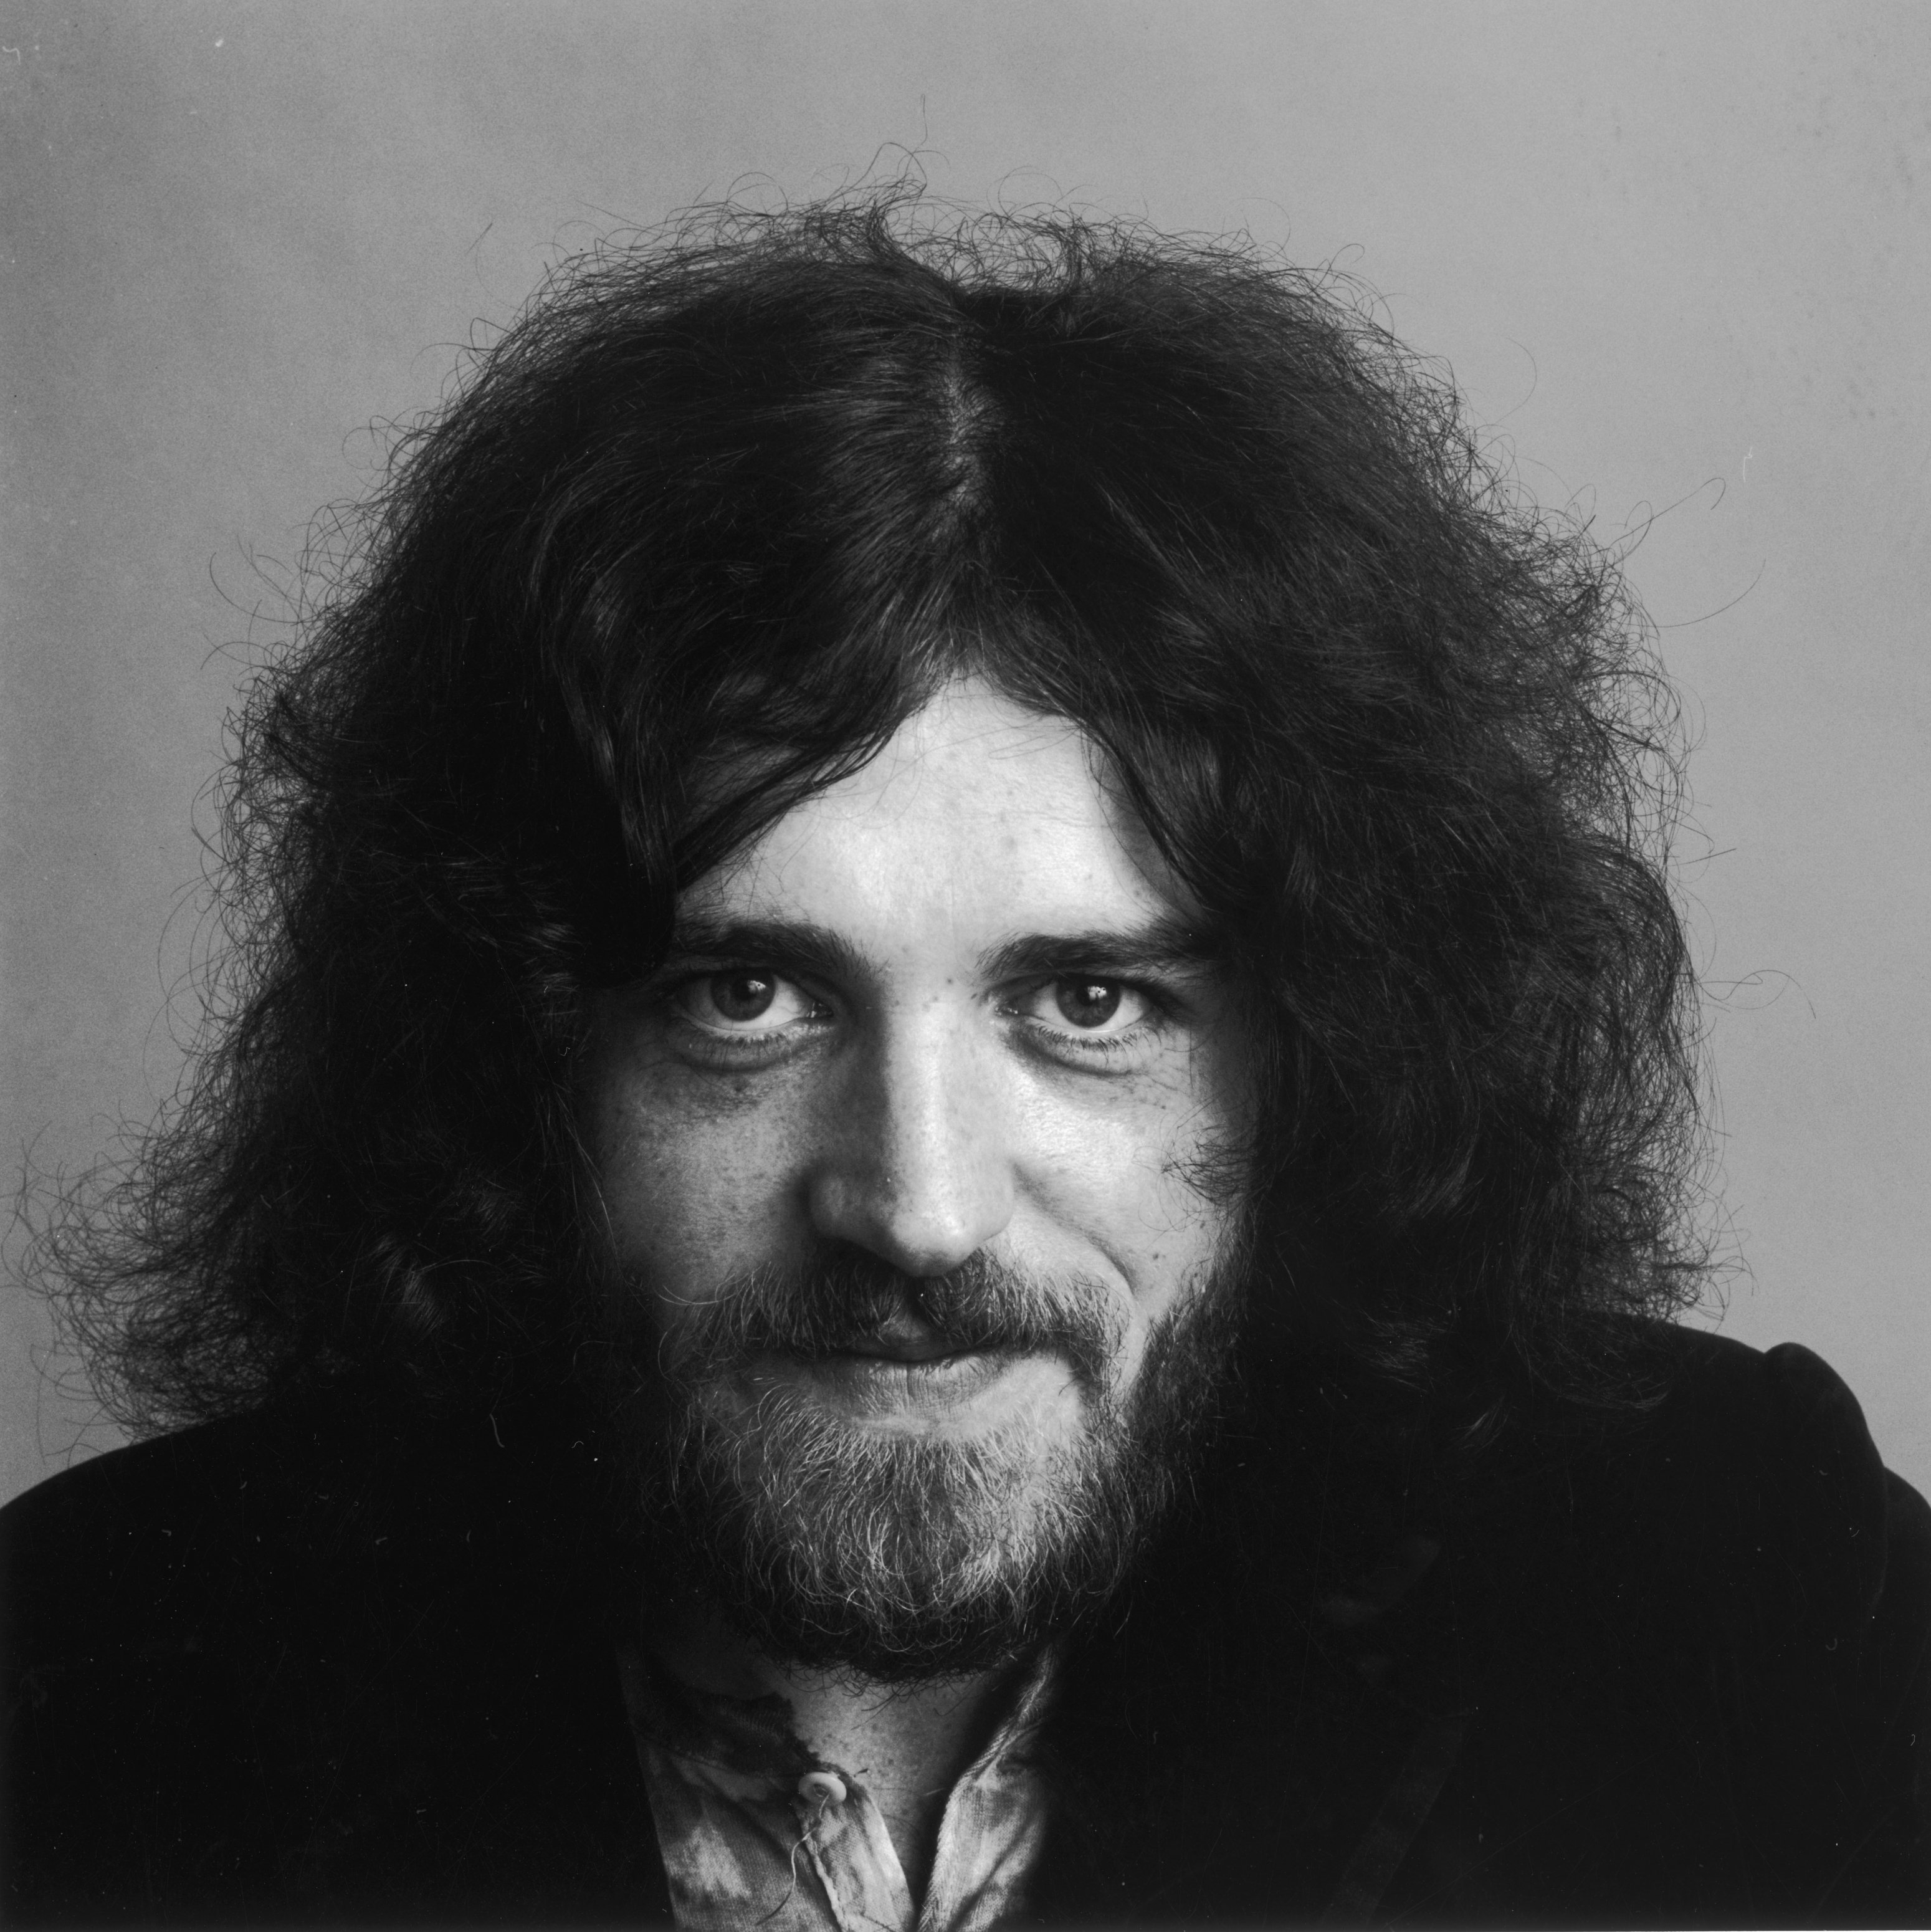 21st November 1969:  Studio headshot portrait of British rock singer Joe Cocker.  (Photo by Jack Robinson/Hulton Archive/Gett